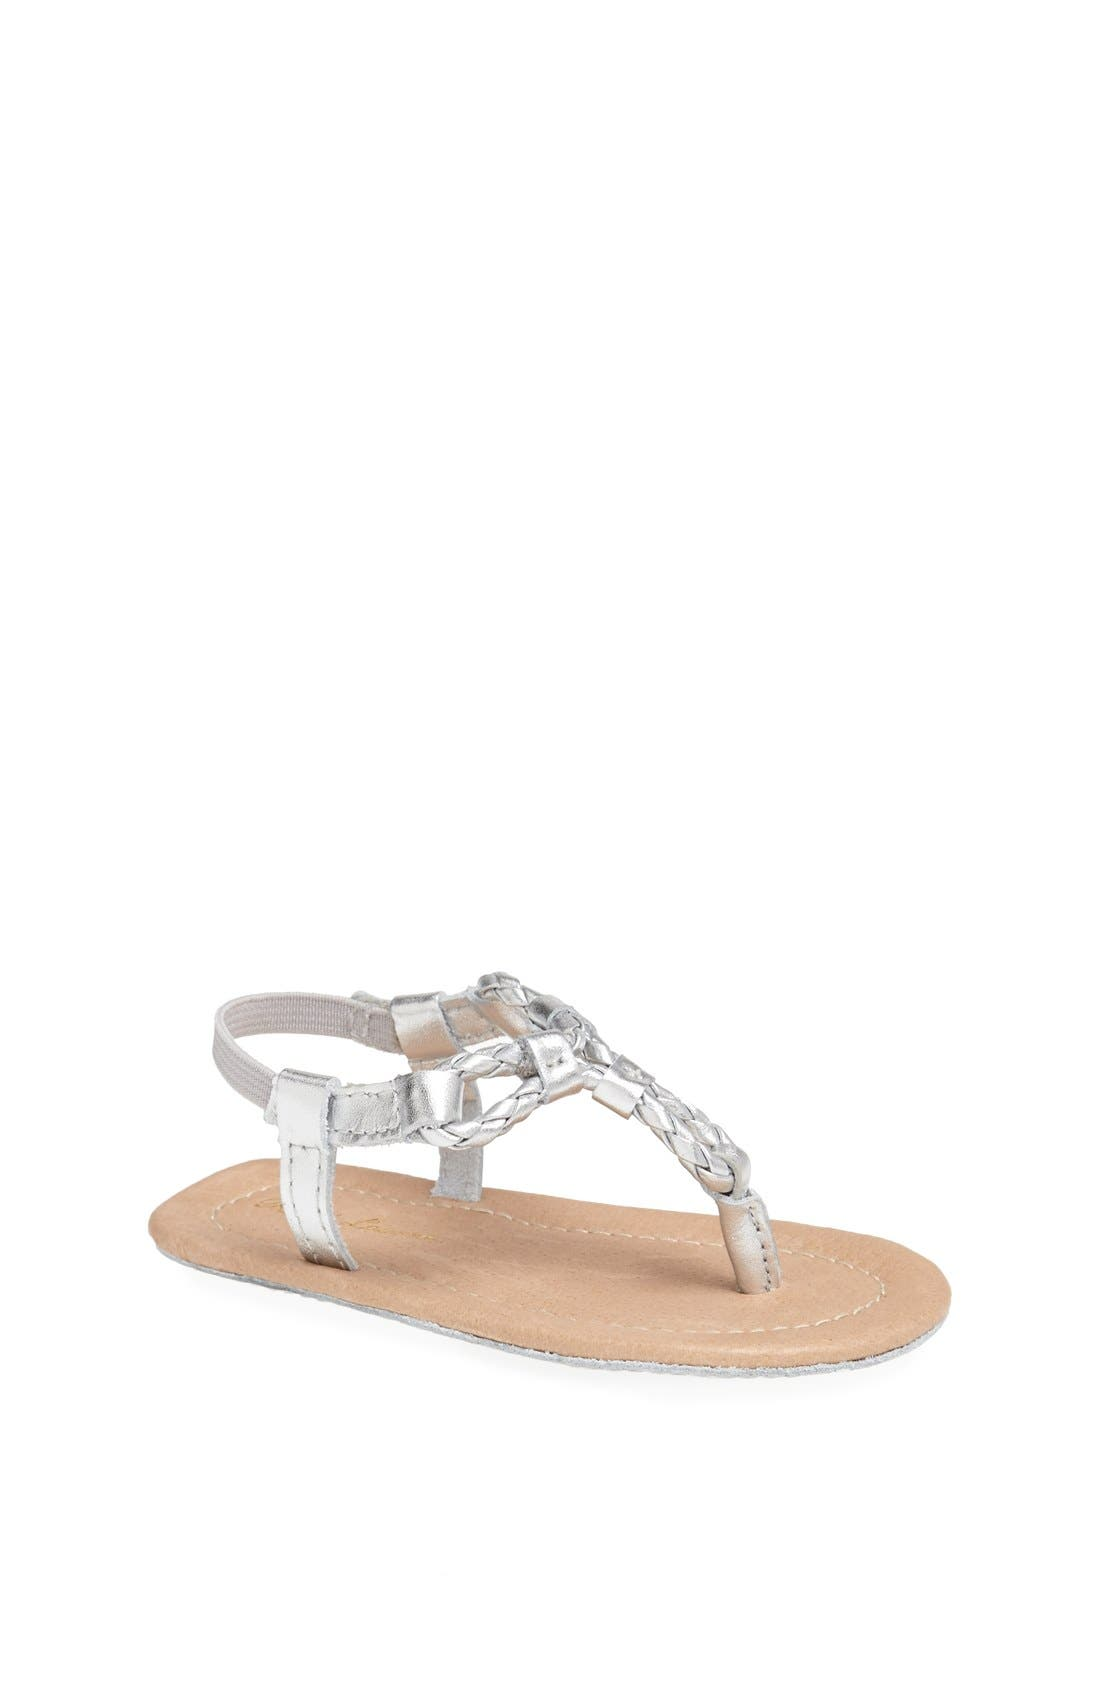 Alternate Image 1 Selected - Ralph Lauren Layette Leather Sandal (Baby Girls)